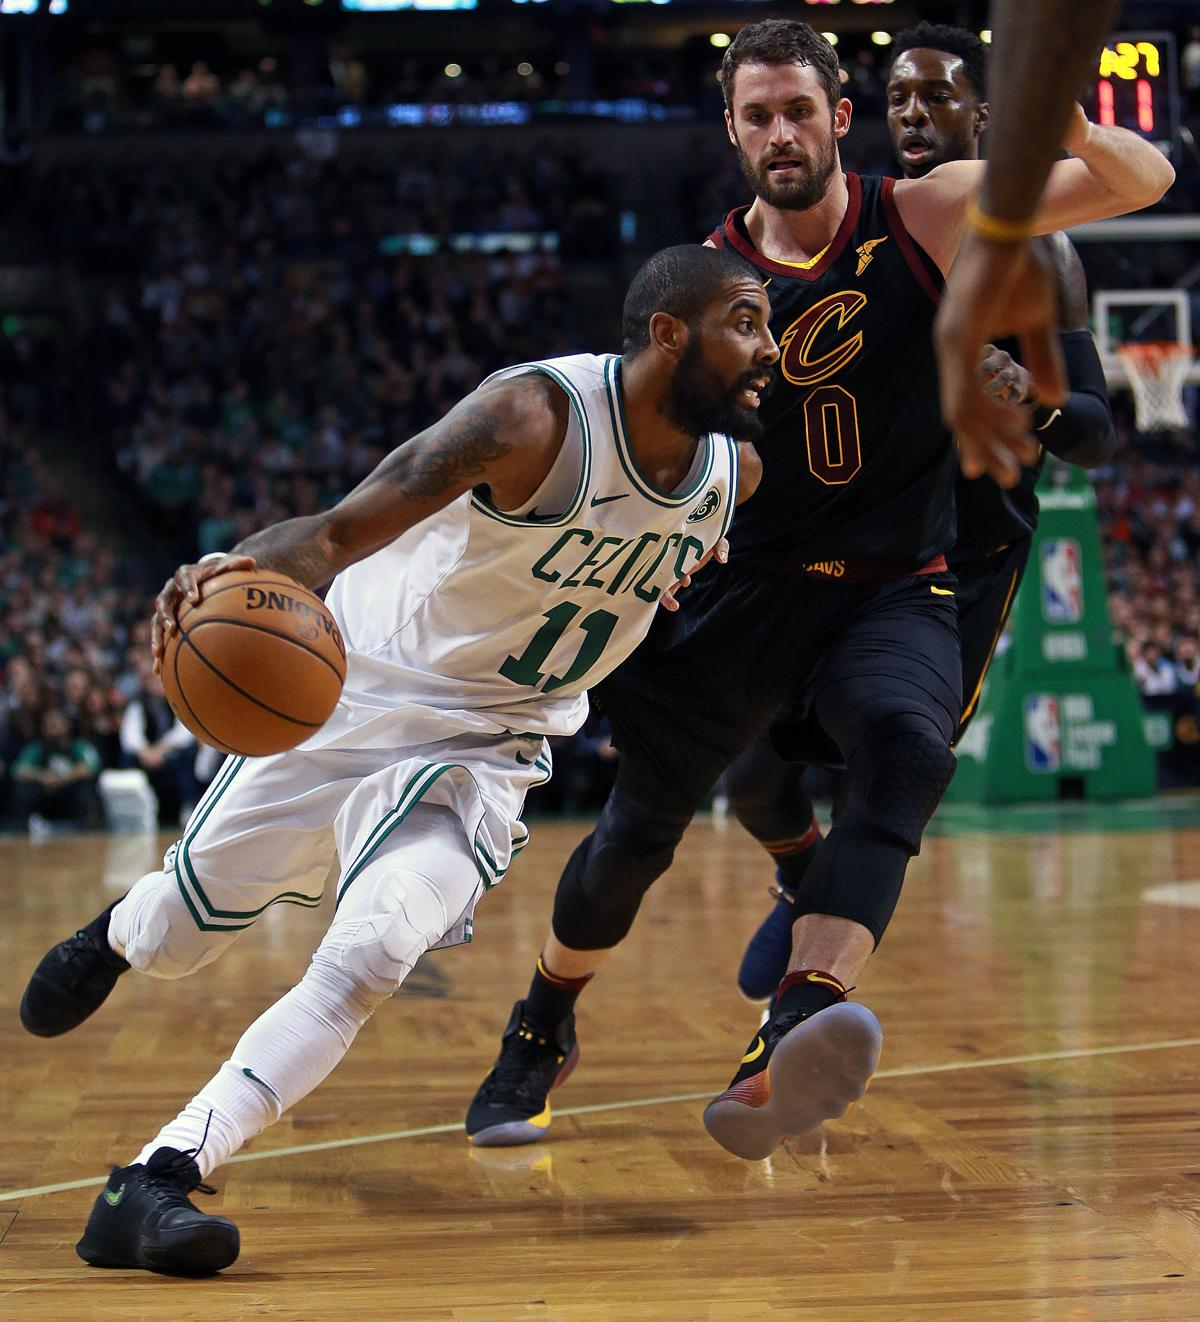 Boston, MA 1-3-18: The Celtics Kyrie Irving (left)